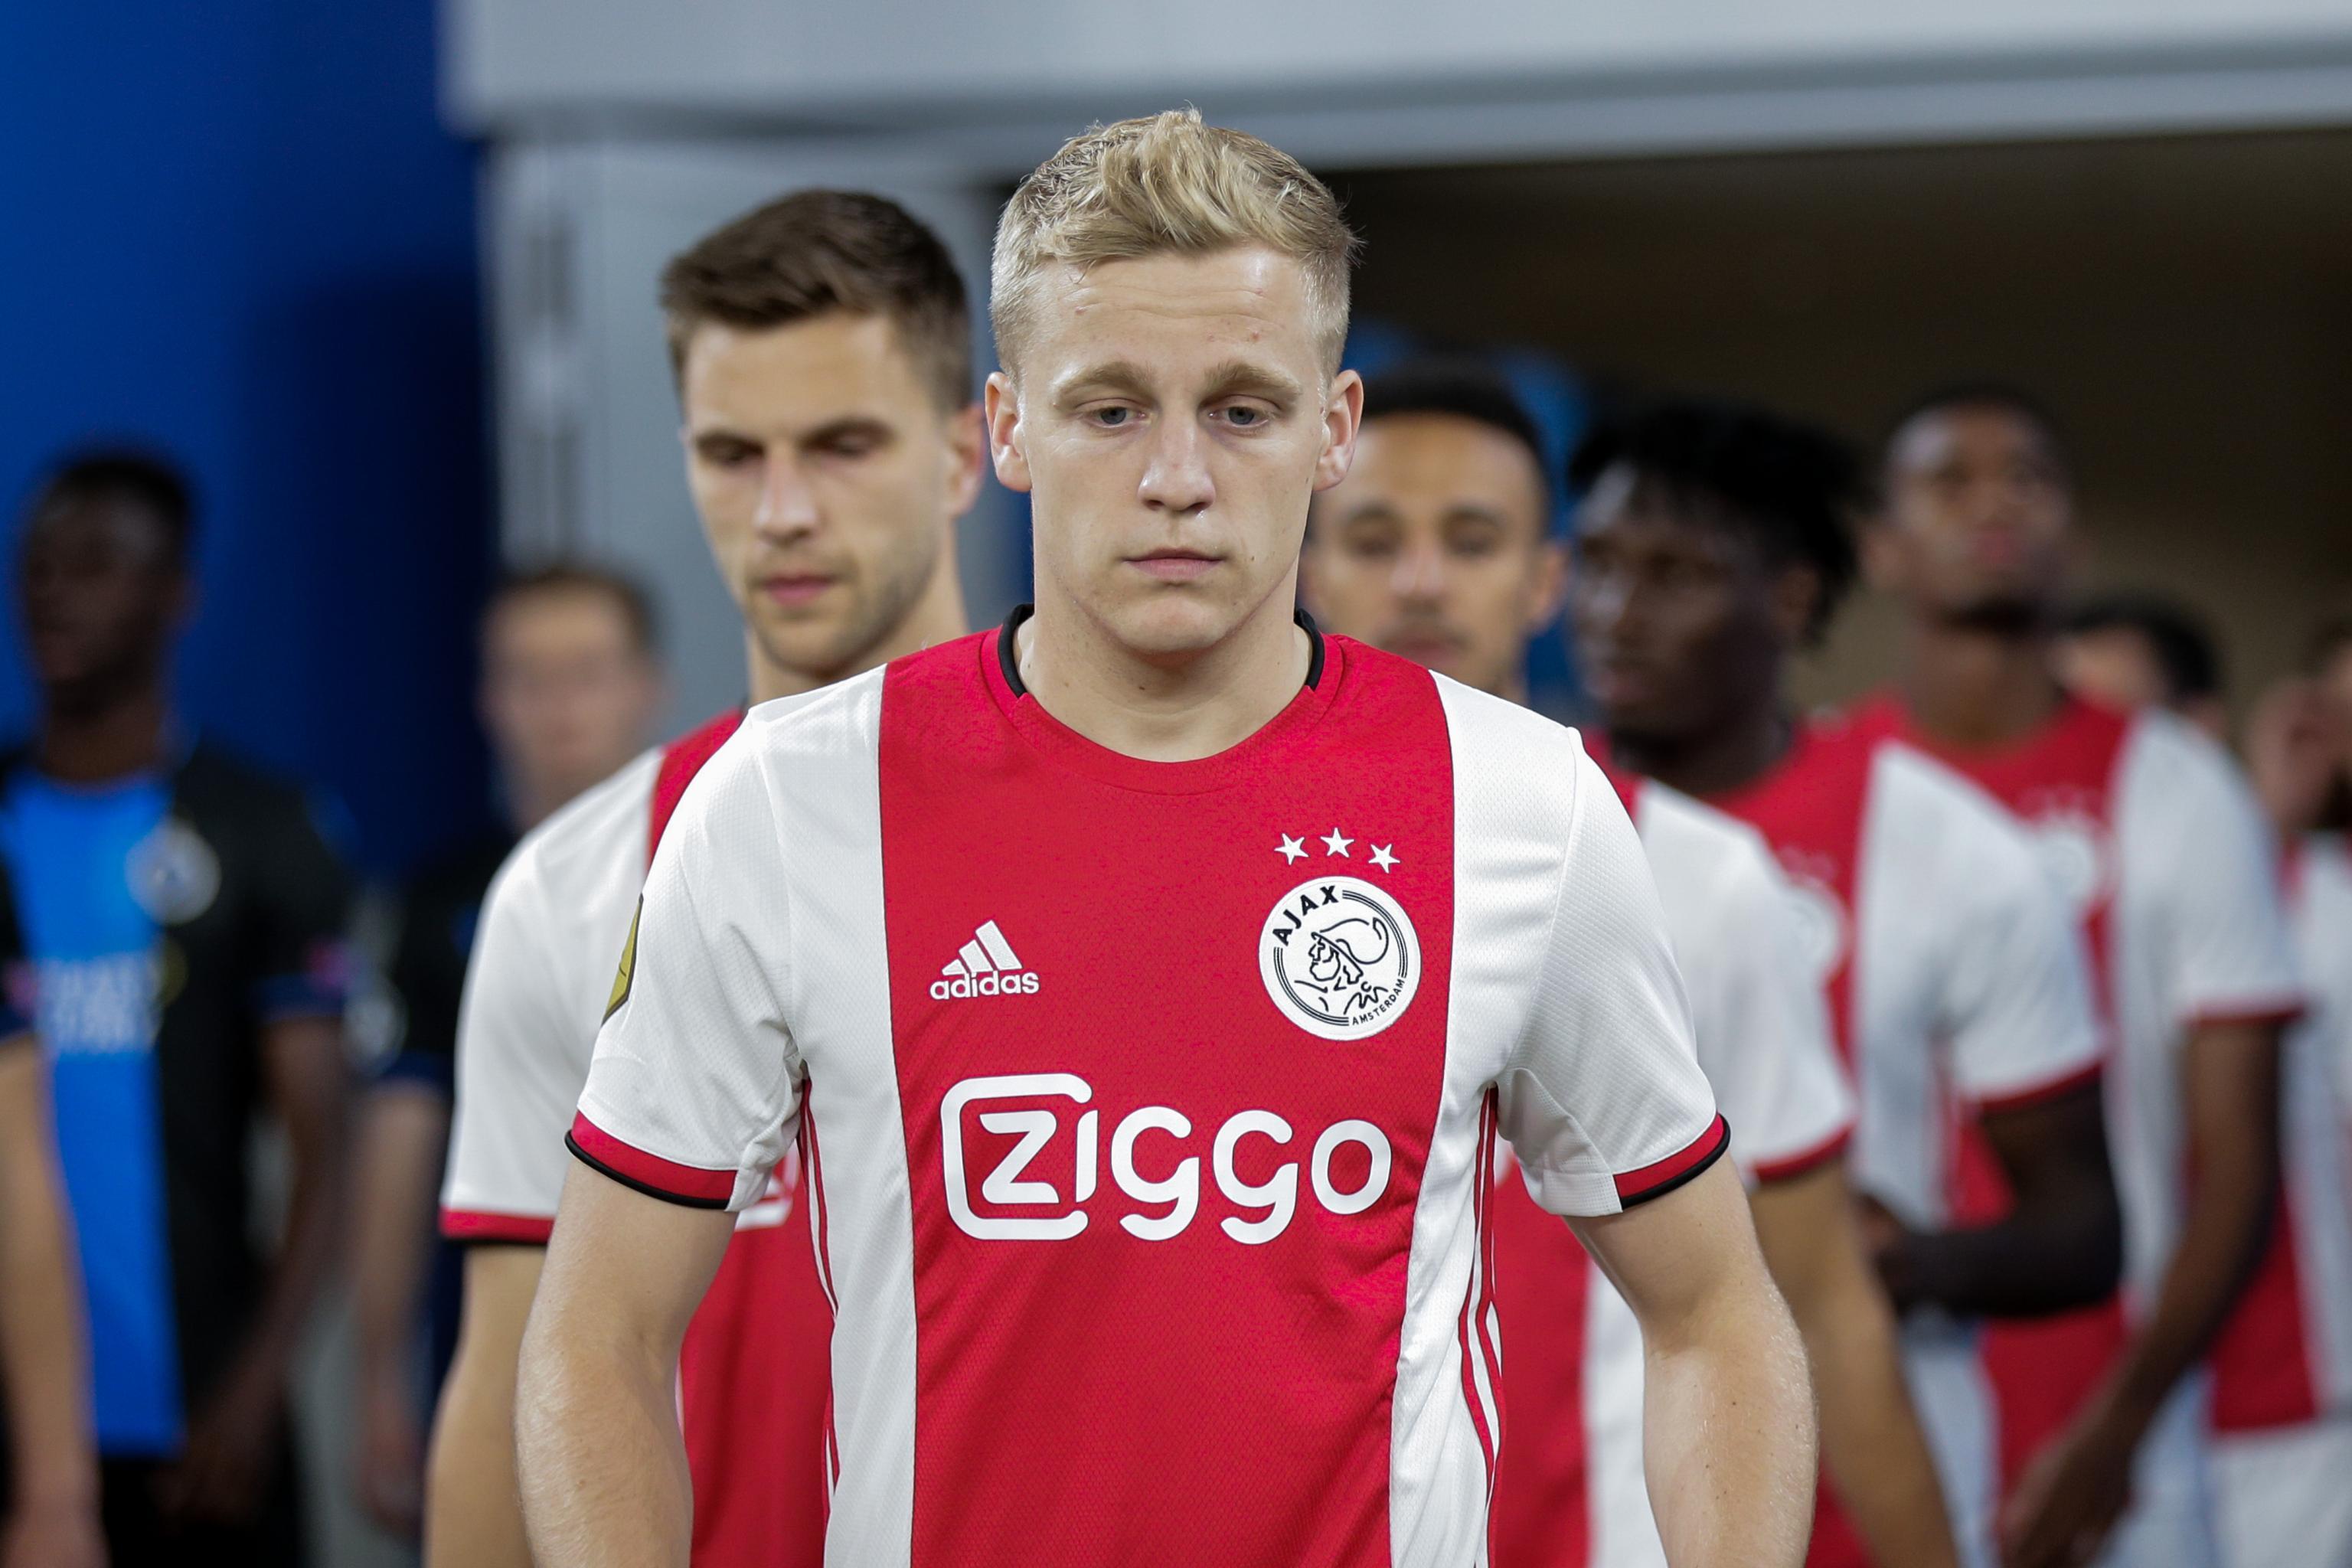 Donny Van De Beek Dismisses Ajax Exit Talk Amid Manchester United Rumours Bleacher Report Latest News Videos And Highlights